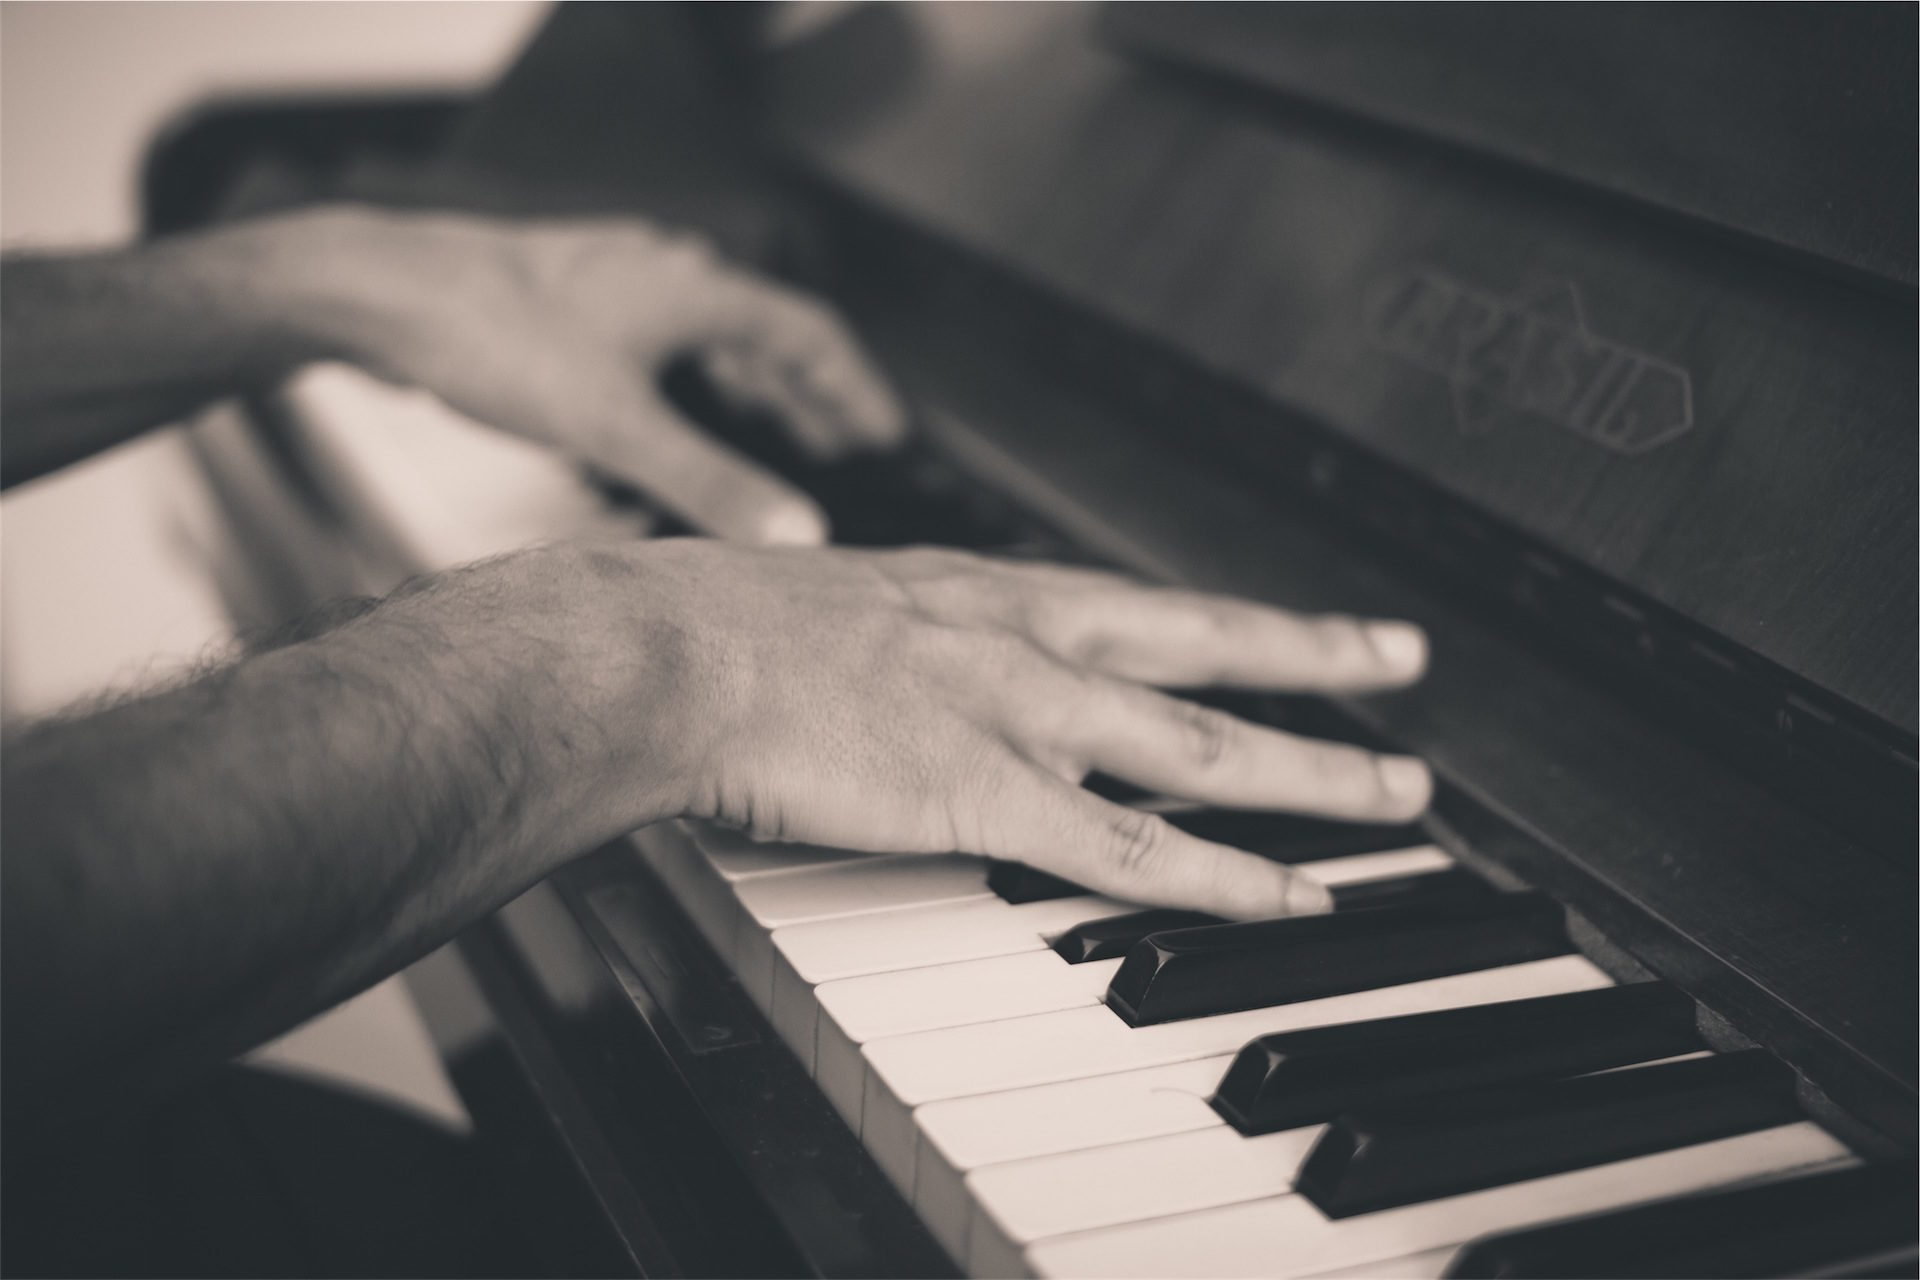 piano, 手, 男, キー, 黒と白の - HD の壁紙 - 教授-falken.com